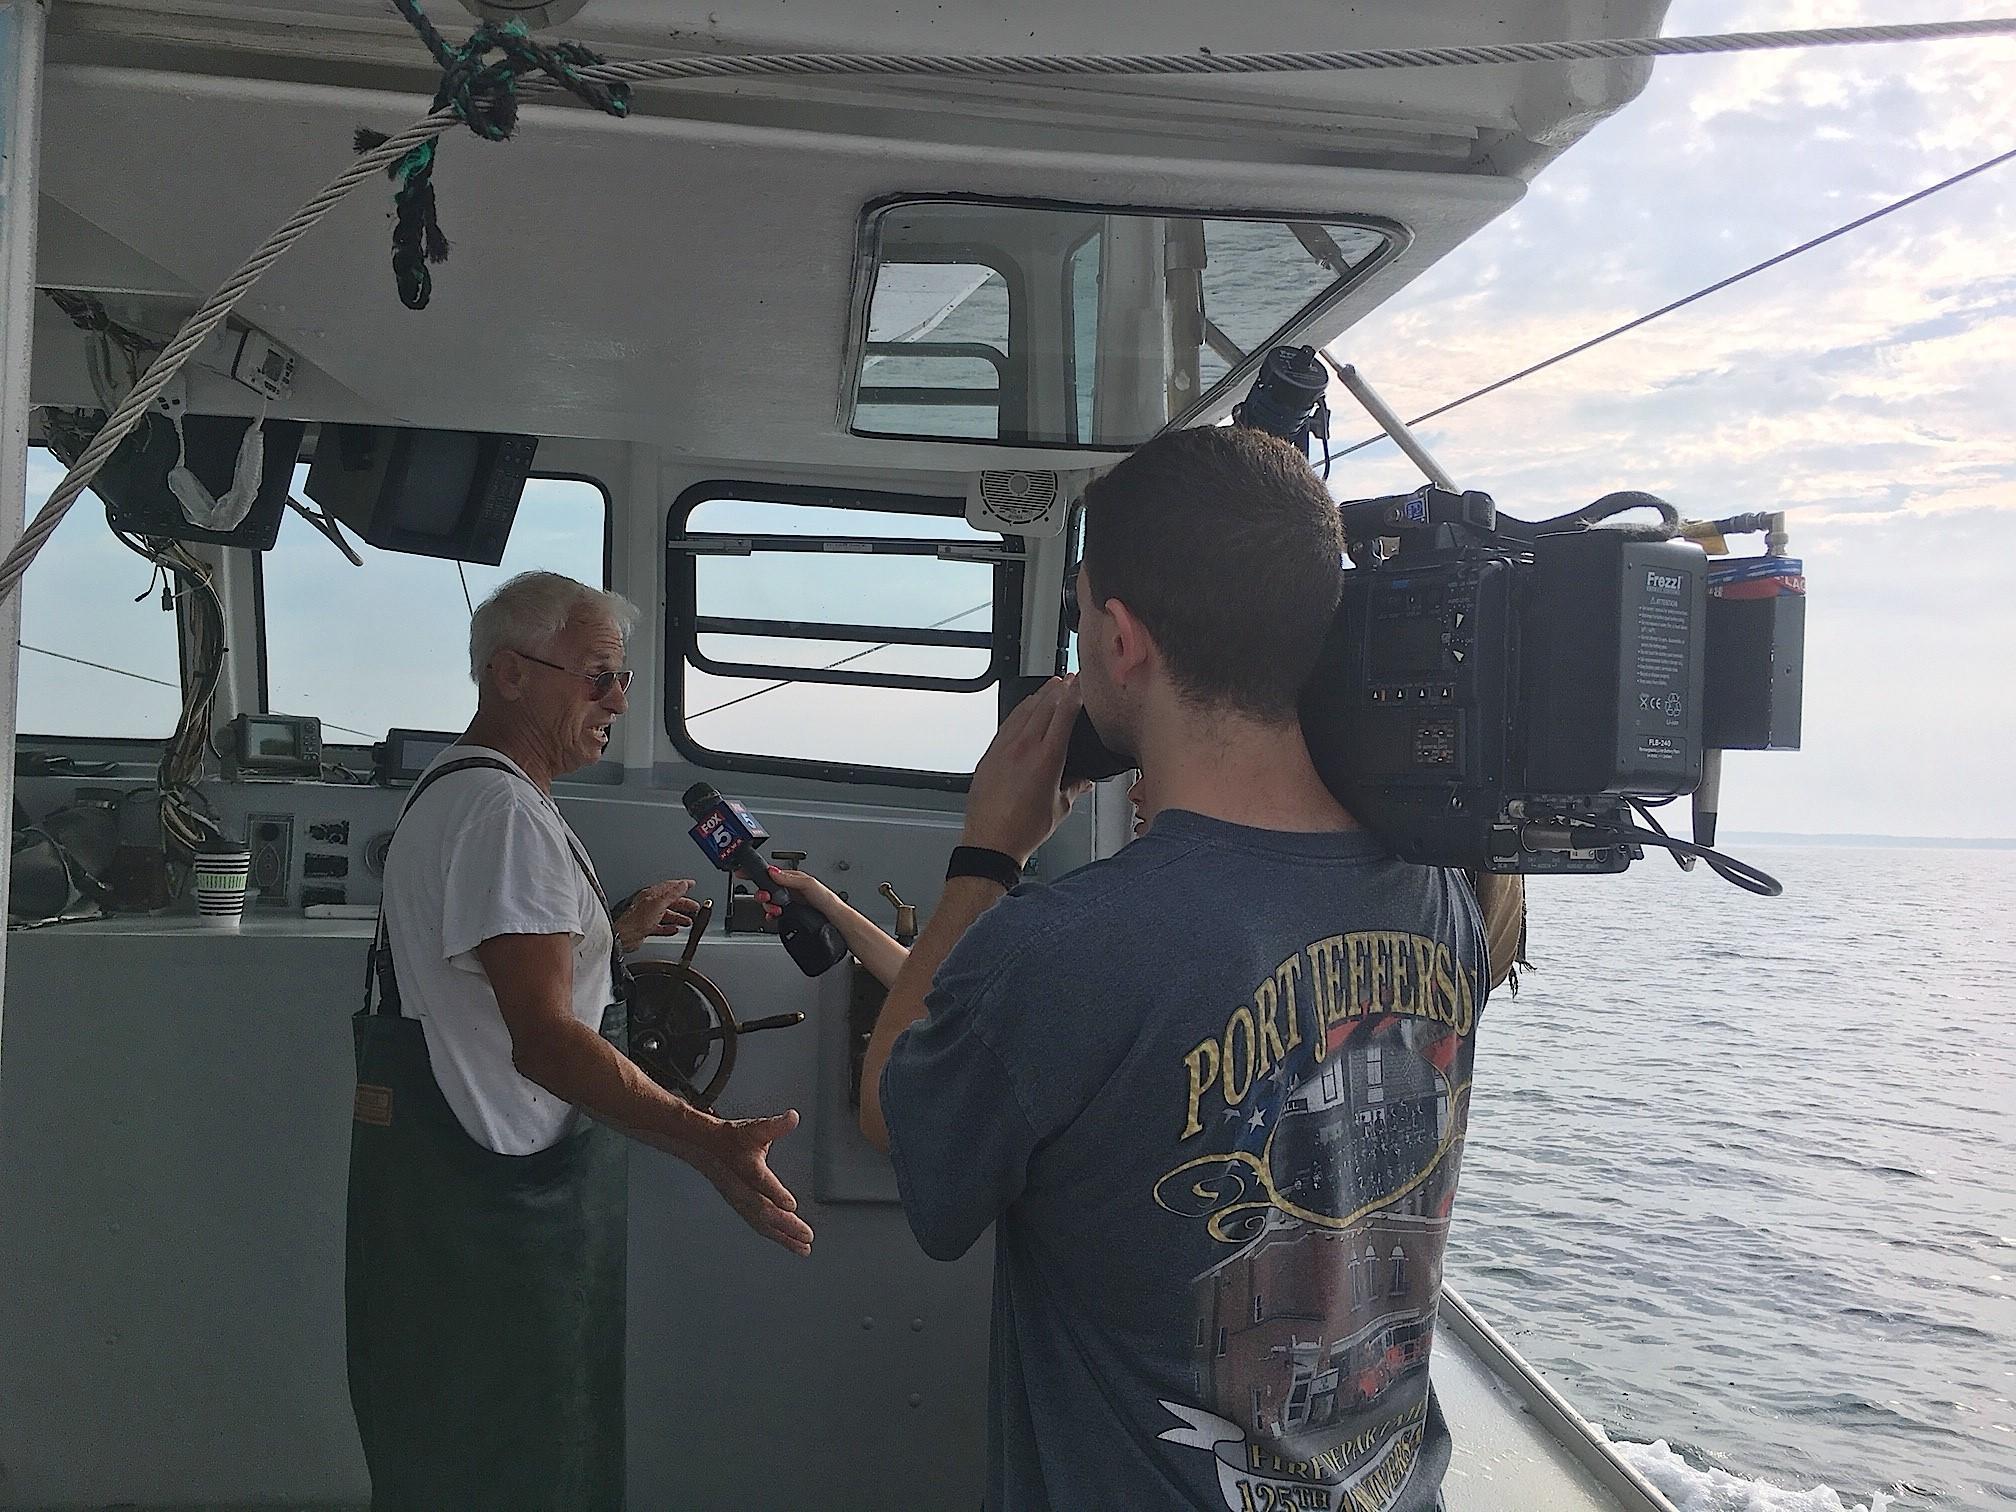 Captain Phil Karlin interviewed by Fox 5's Jodi Goldberg